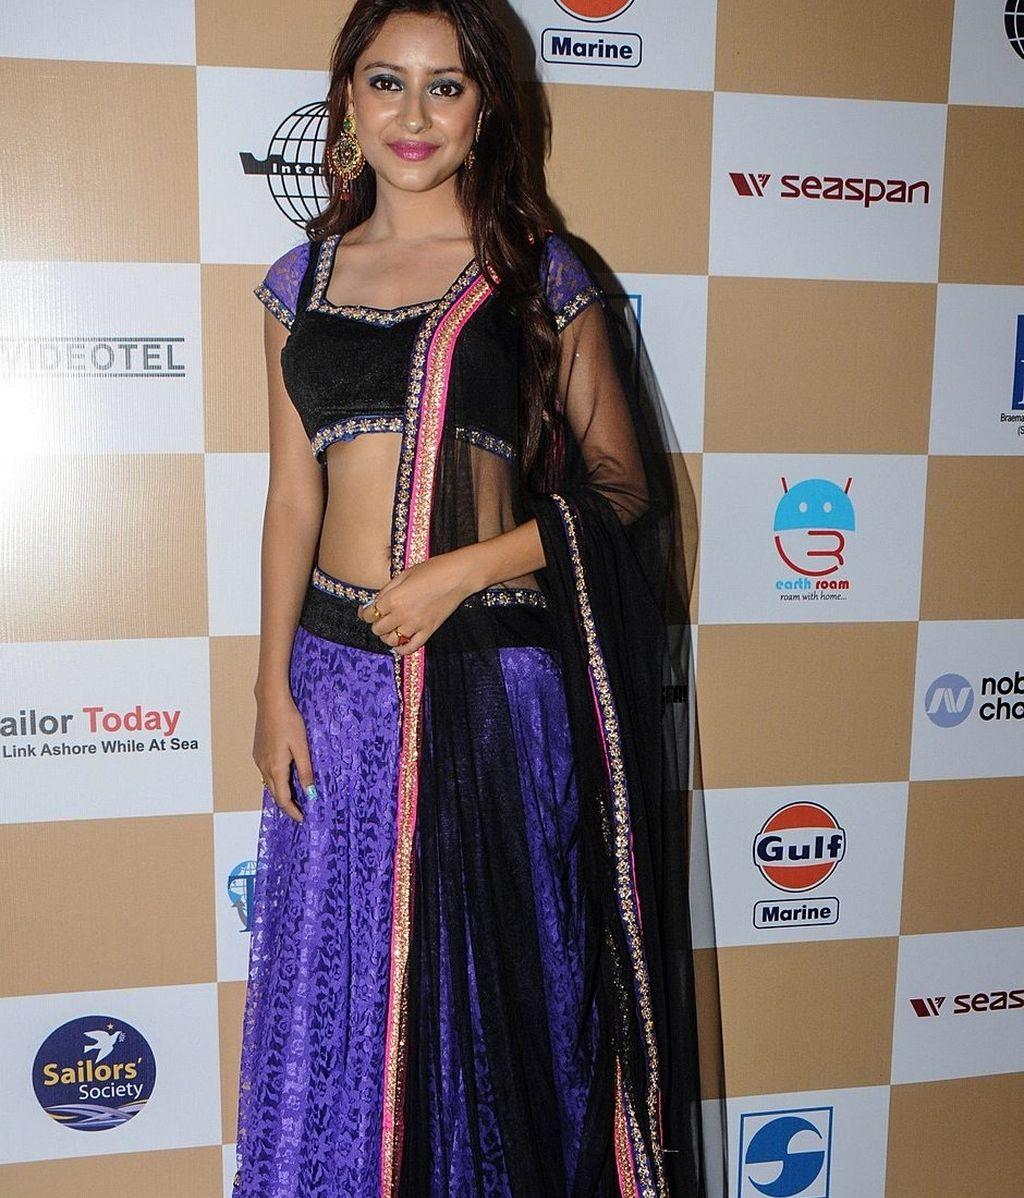 Pratyusha Banerjee, estrella de Bollywood